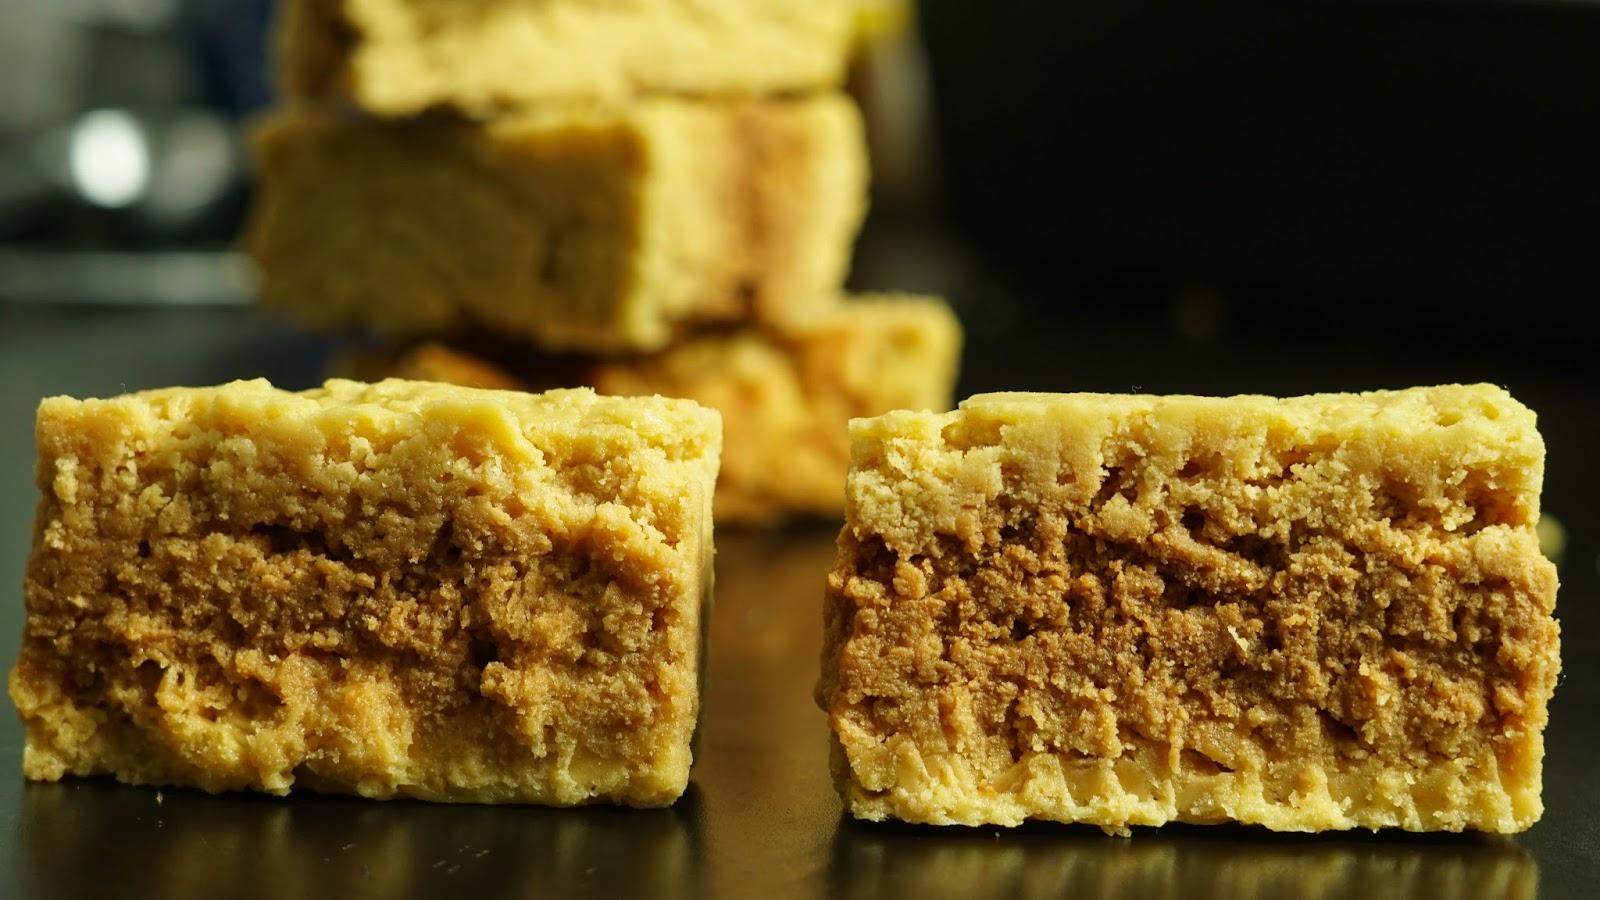 Cake Recipes In Madras Samayal: Mysore Pak Recipe / Hard Mysorepak Recipe